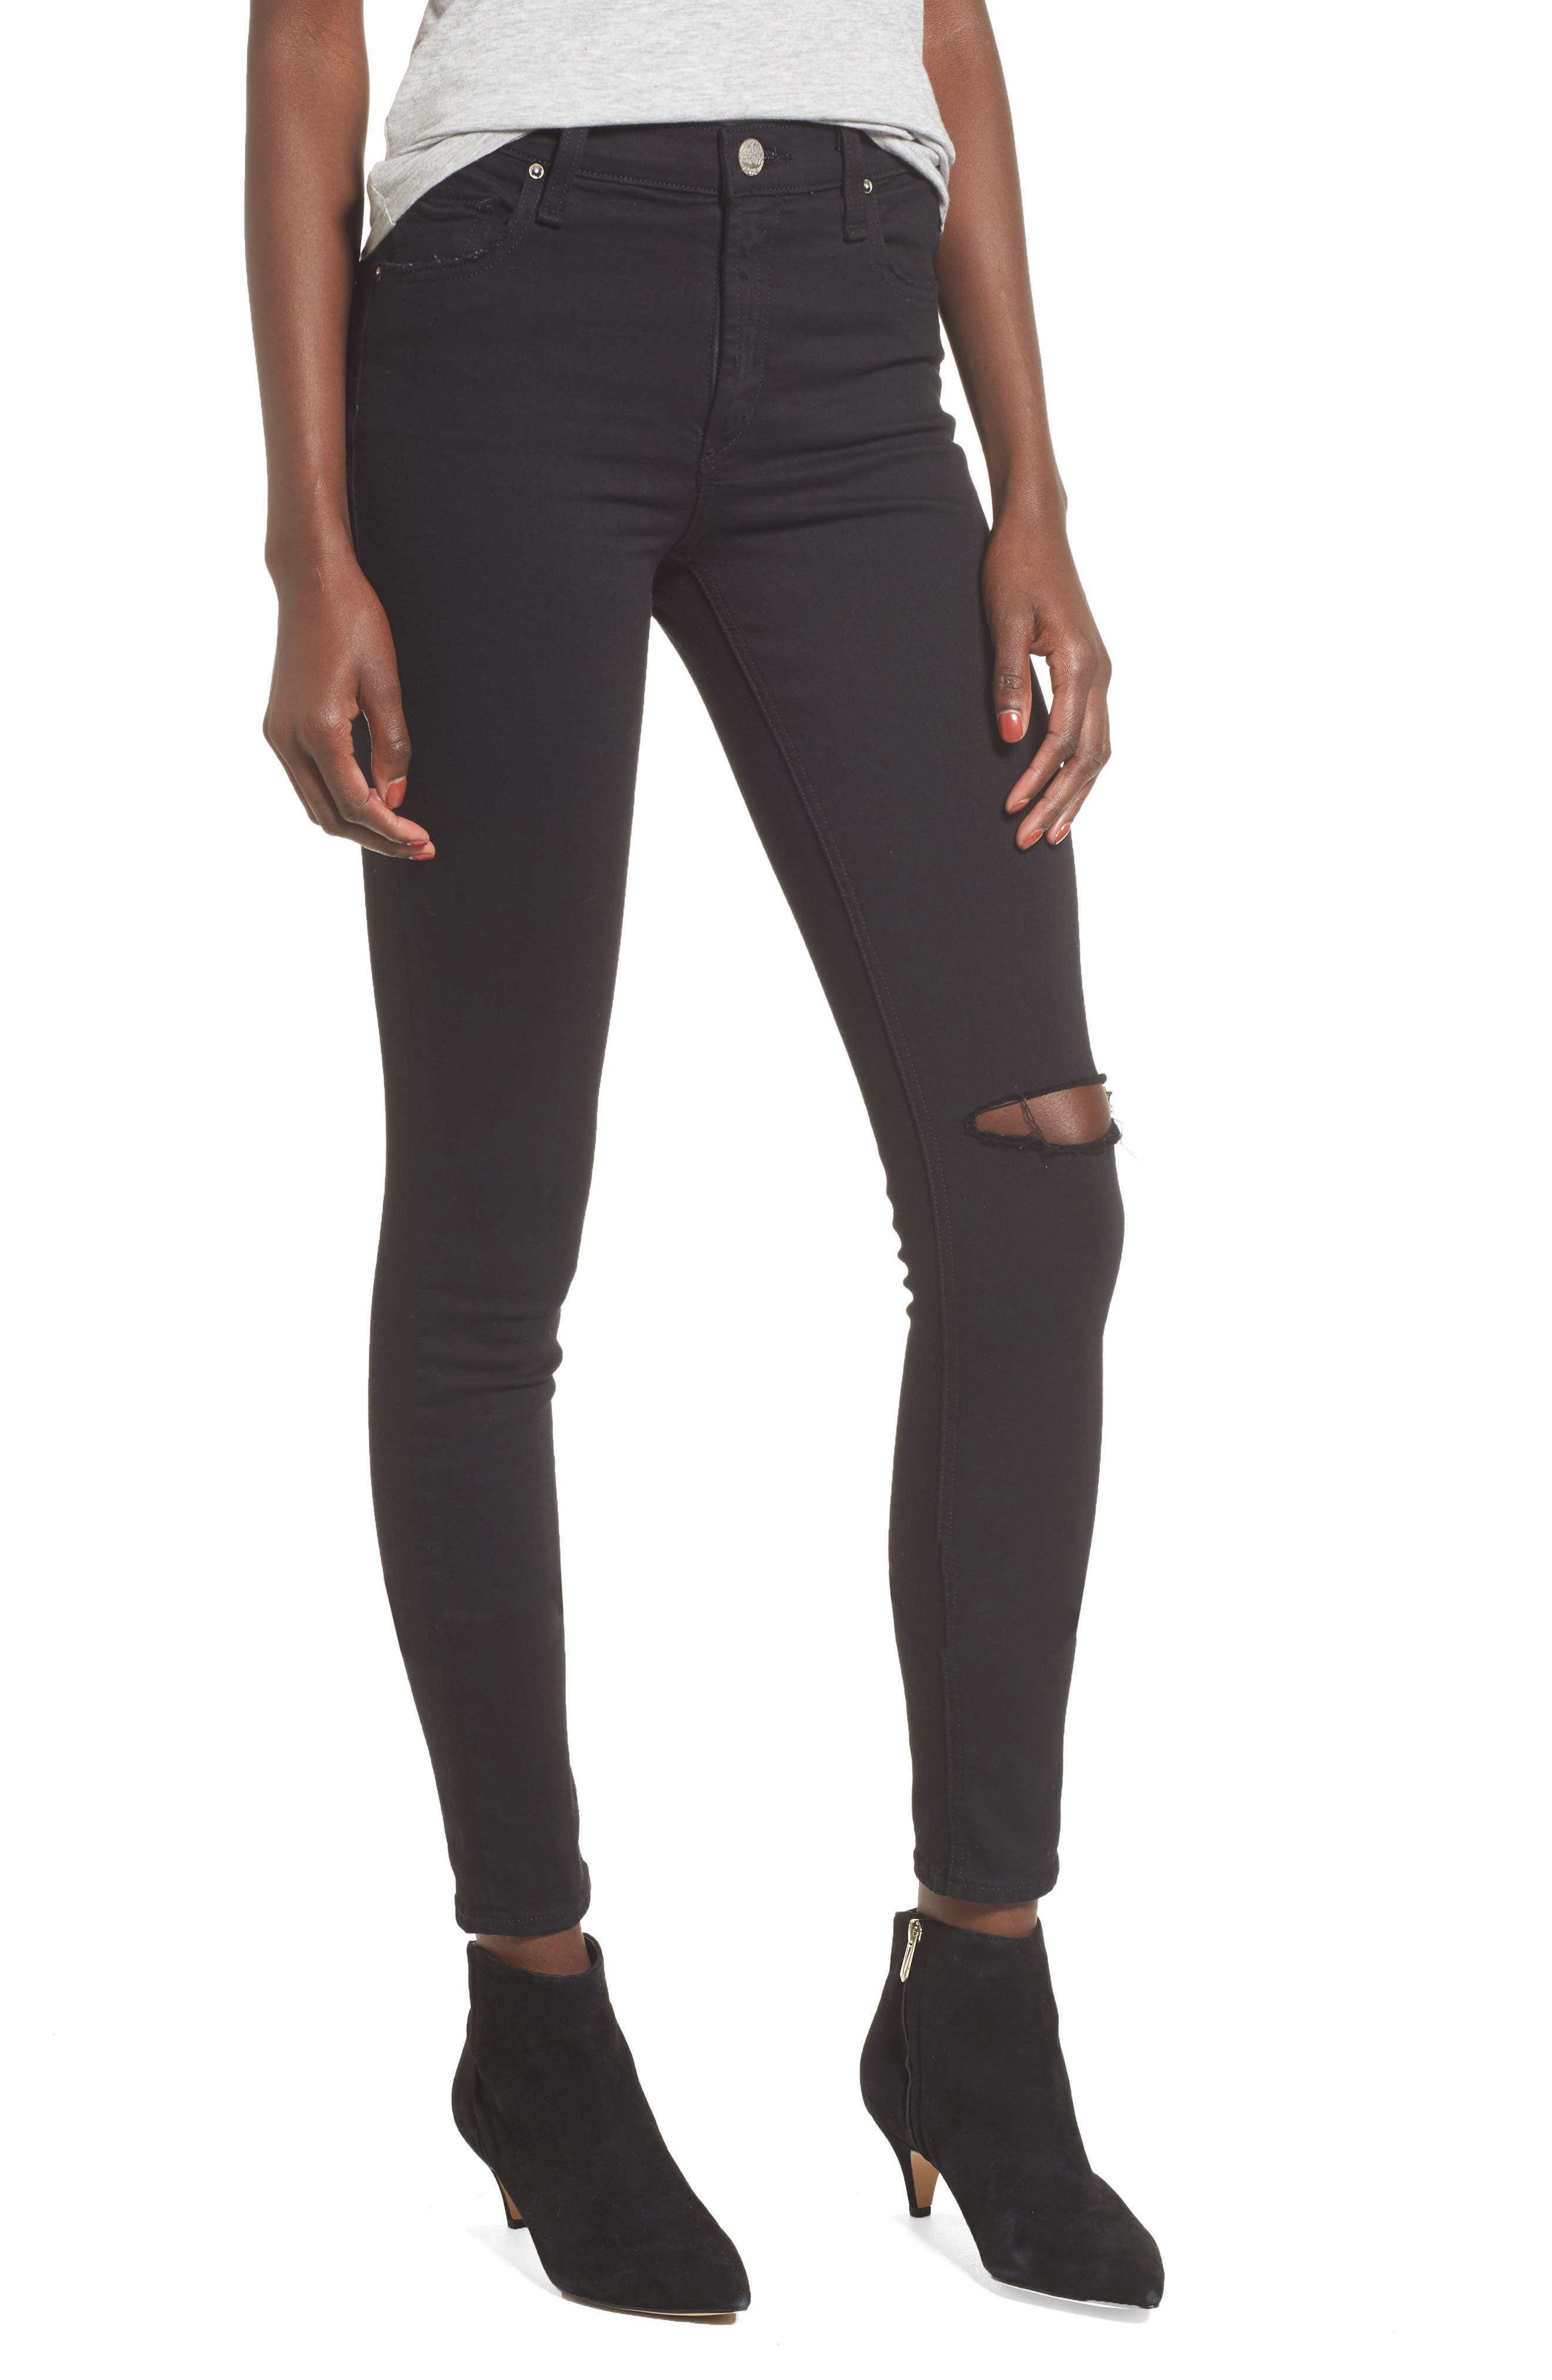 Newton High Waist Ankle Skinny Jeans,                             Main thumbnail 1, color,                             001